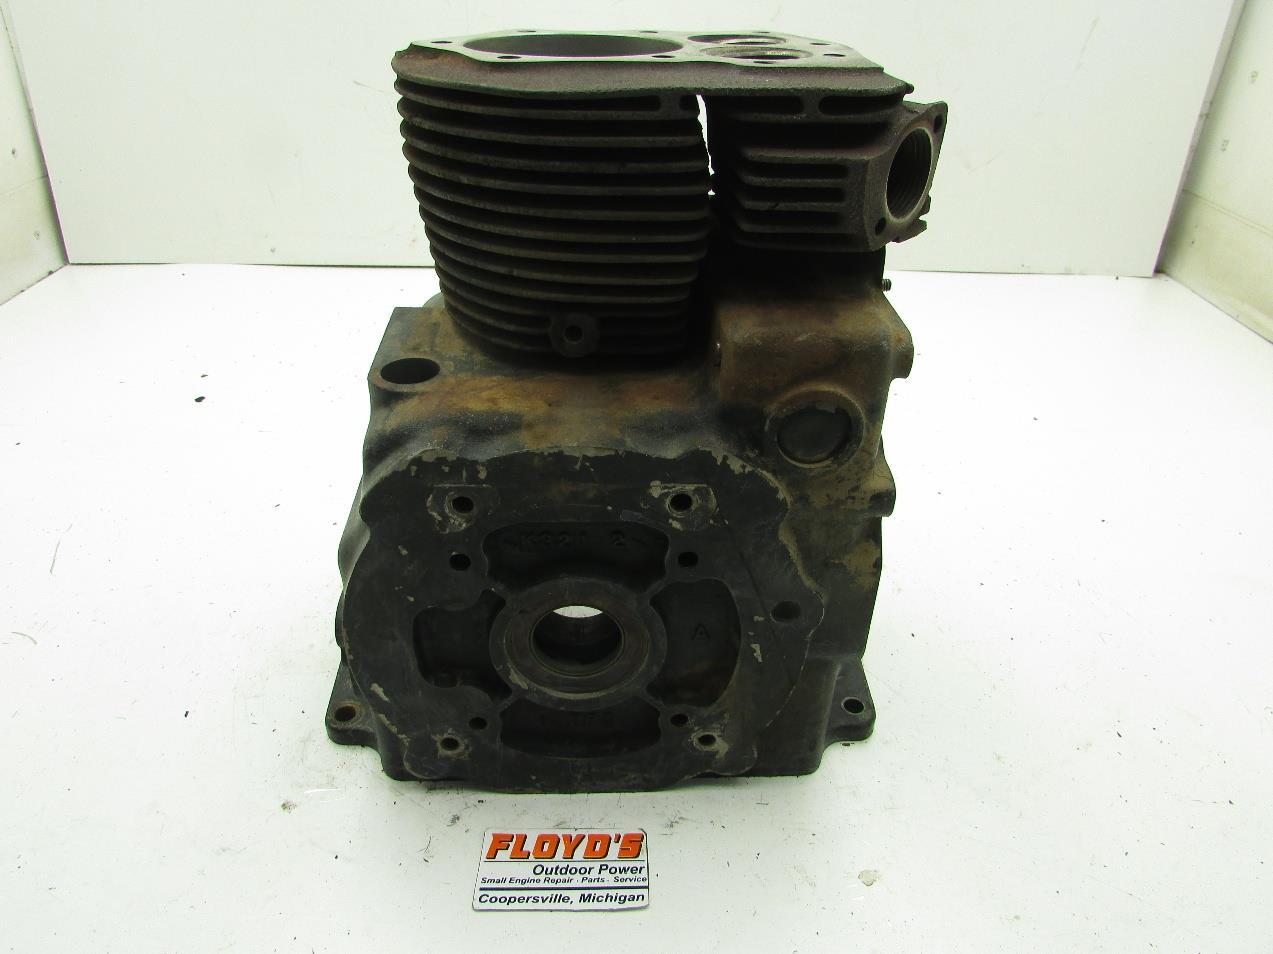 John Deere 314 Kohler Engine Engines Wiring Harness Amazoncom Ignition Coil 210 212 214